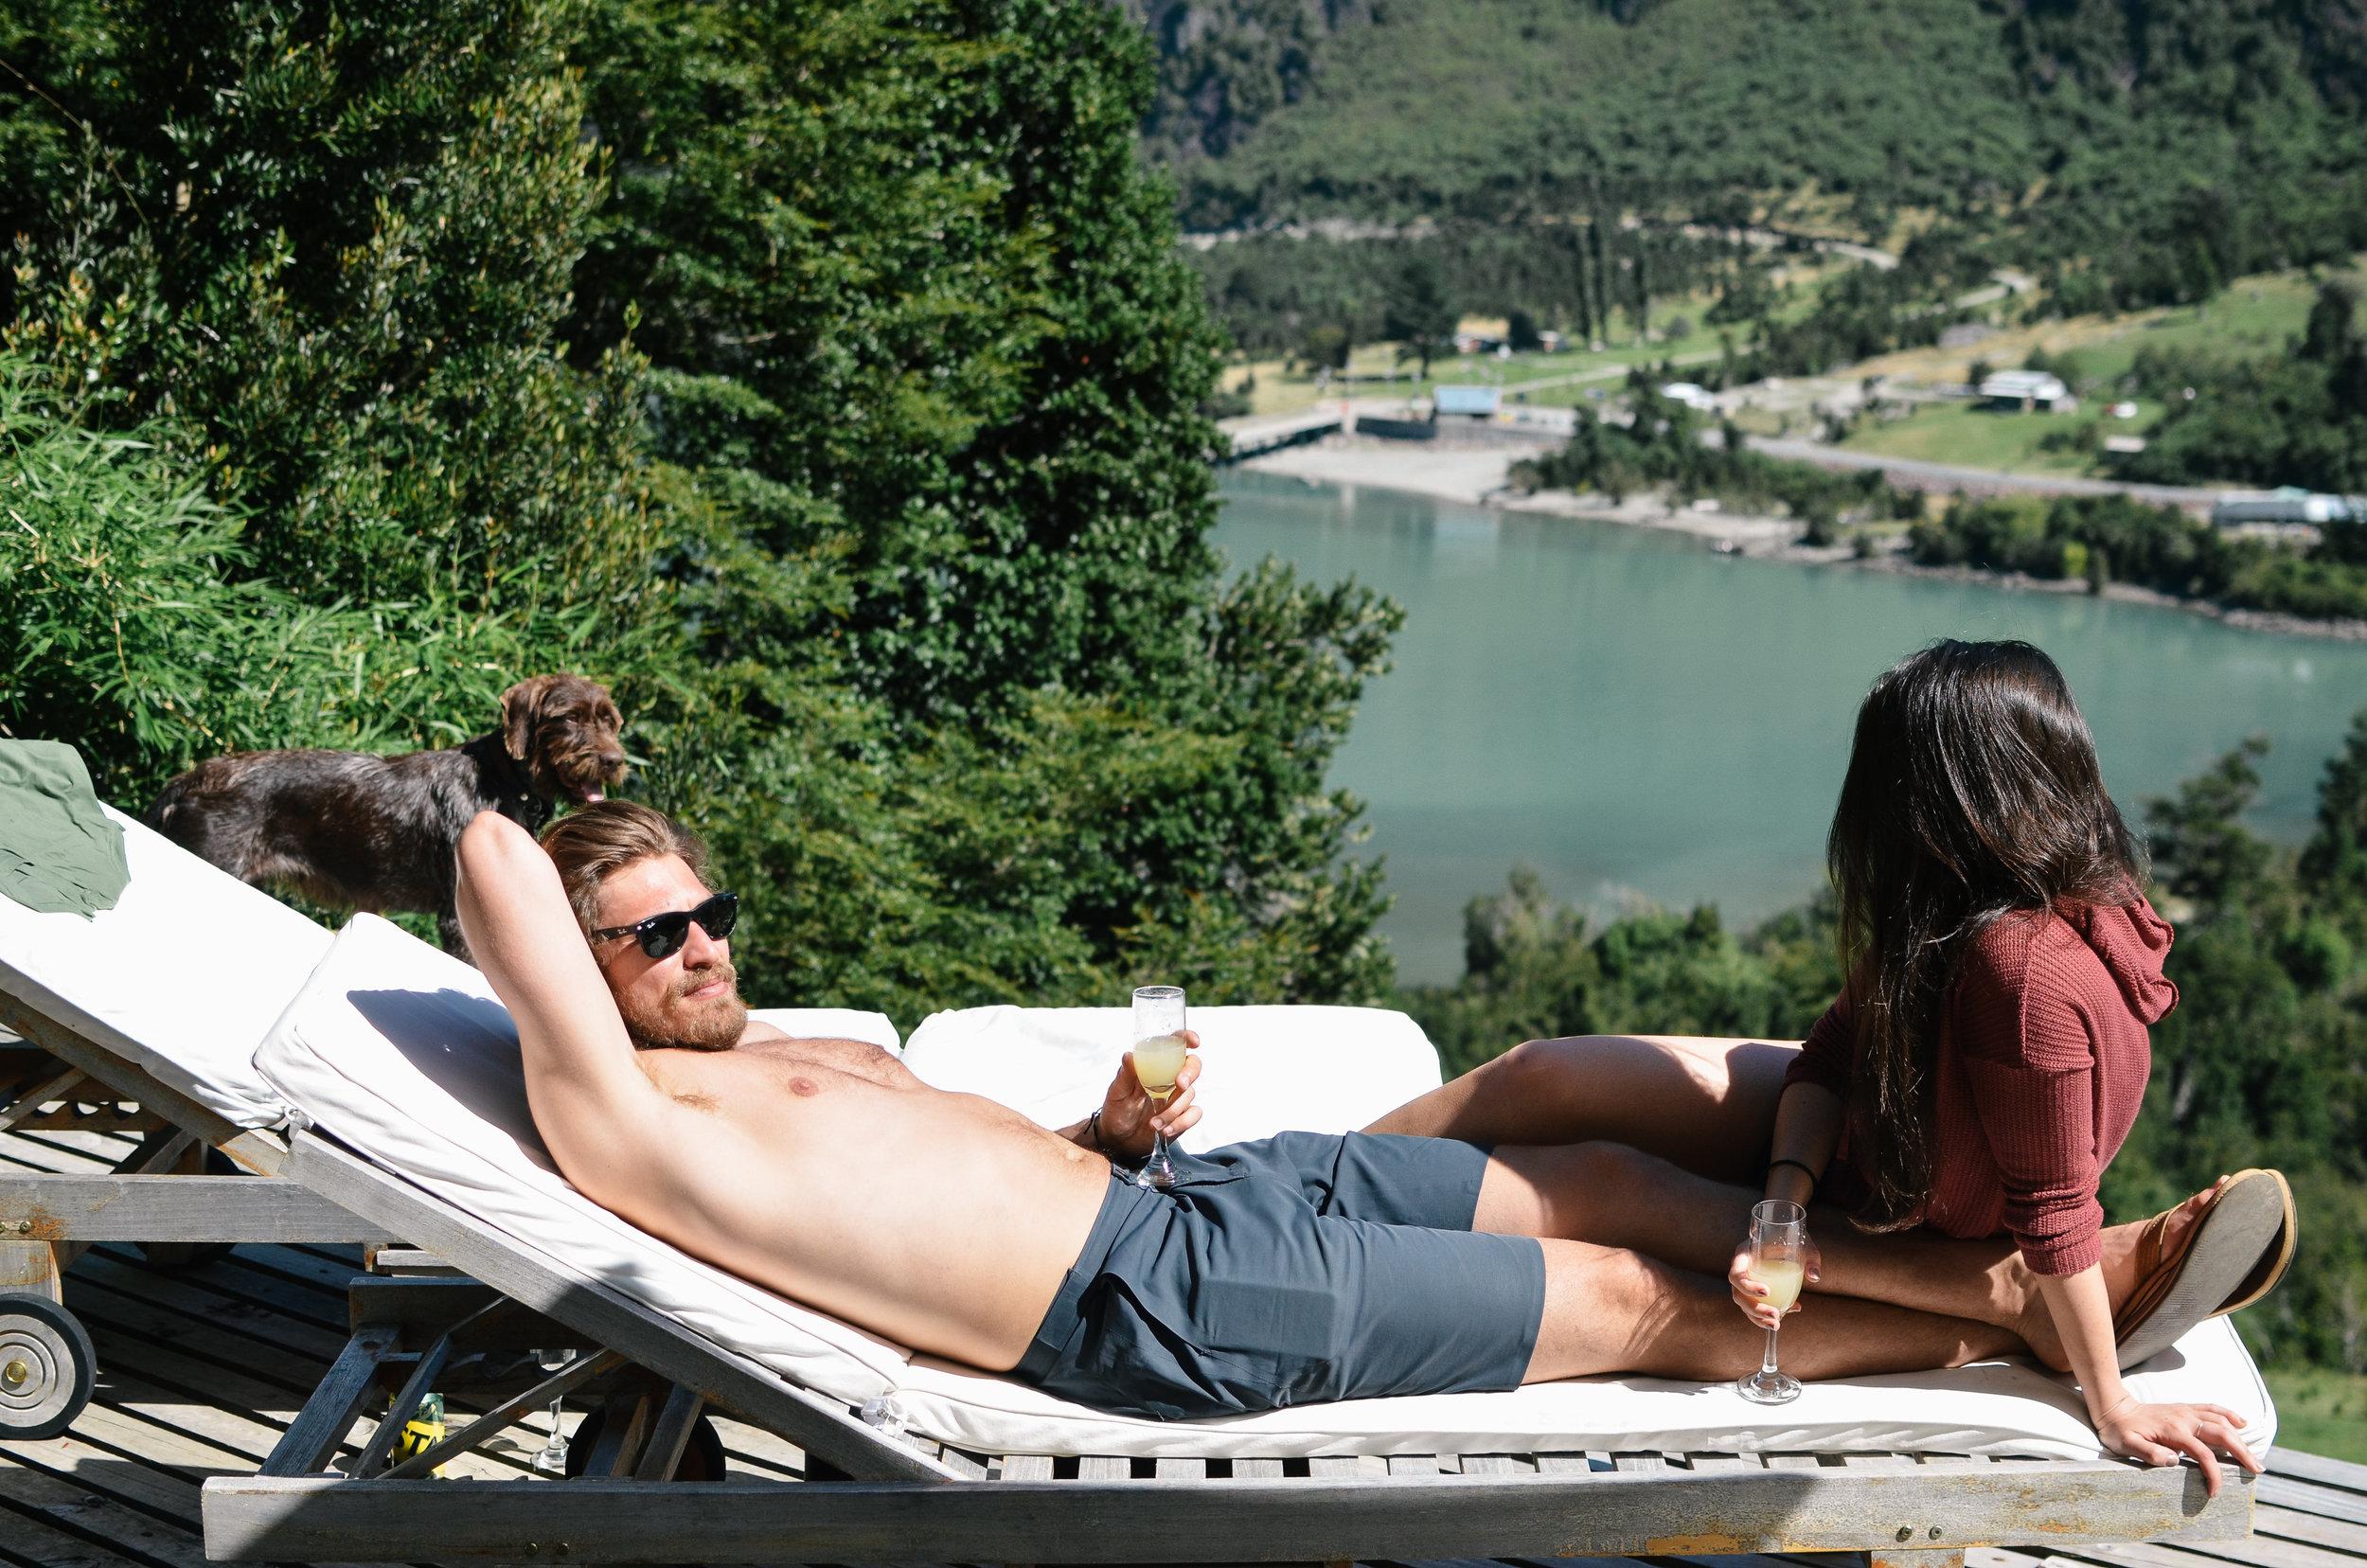 barraco+lodge+chile+life+on+pine+travel+blog+life+on+pine_DSC_1336.jpg